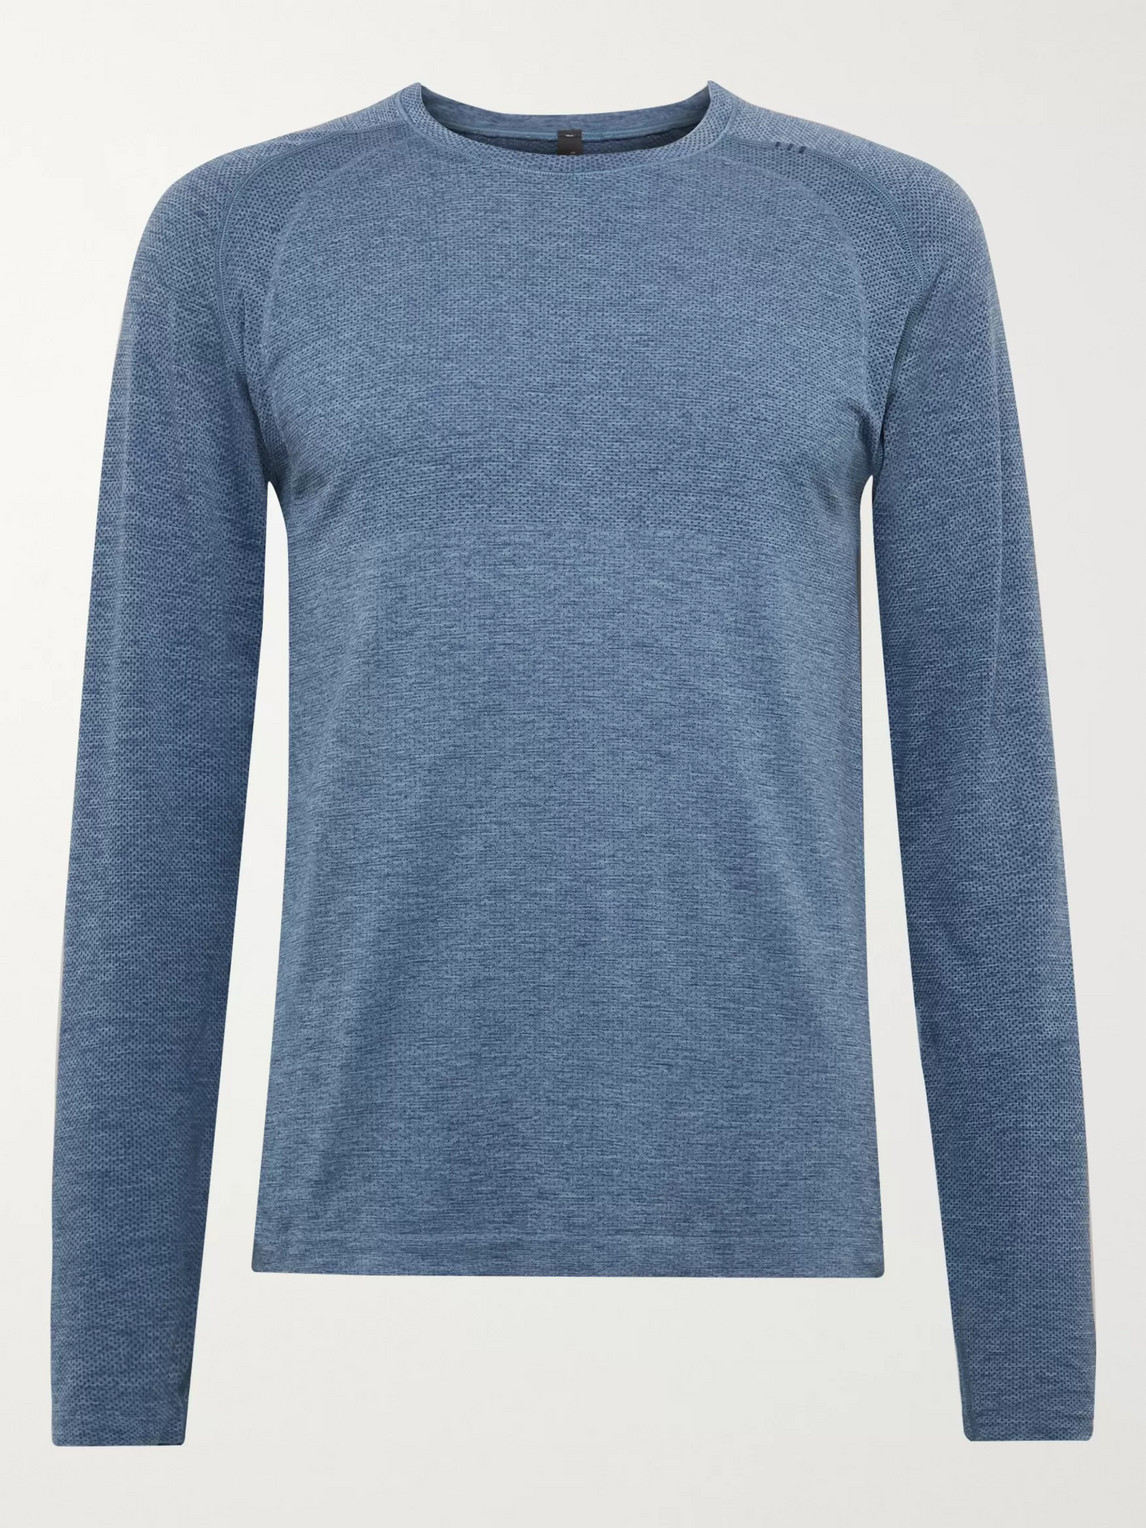 lululemon - metal vent tech 2.0 mã©lange stretch-jersey t-shirt - men - blue